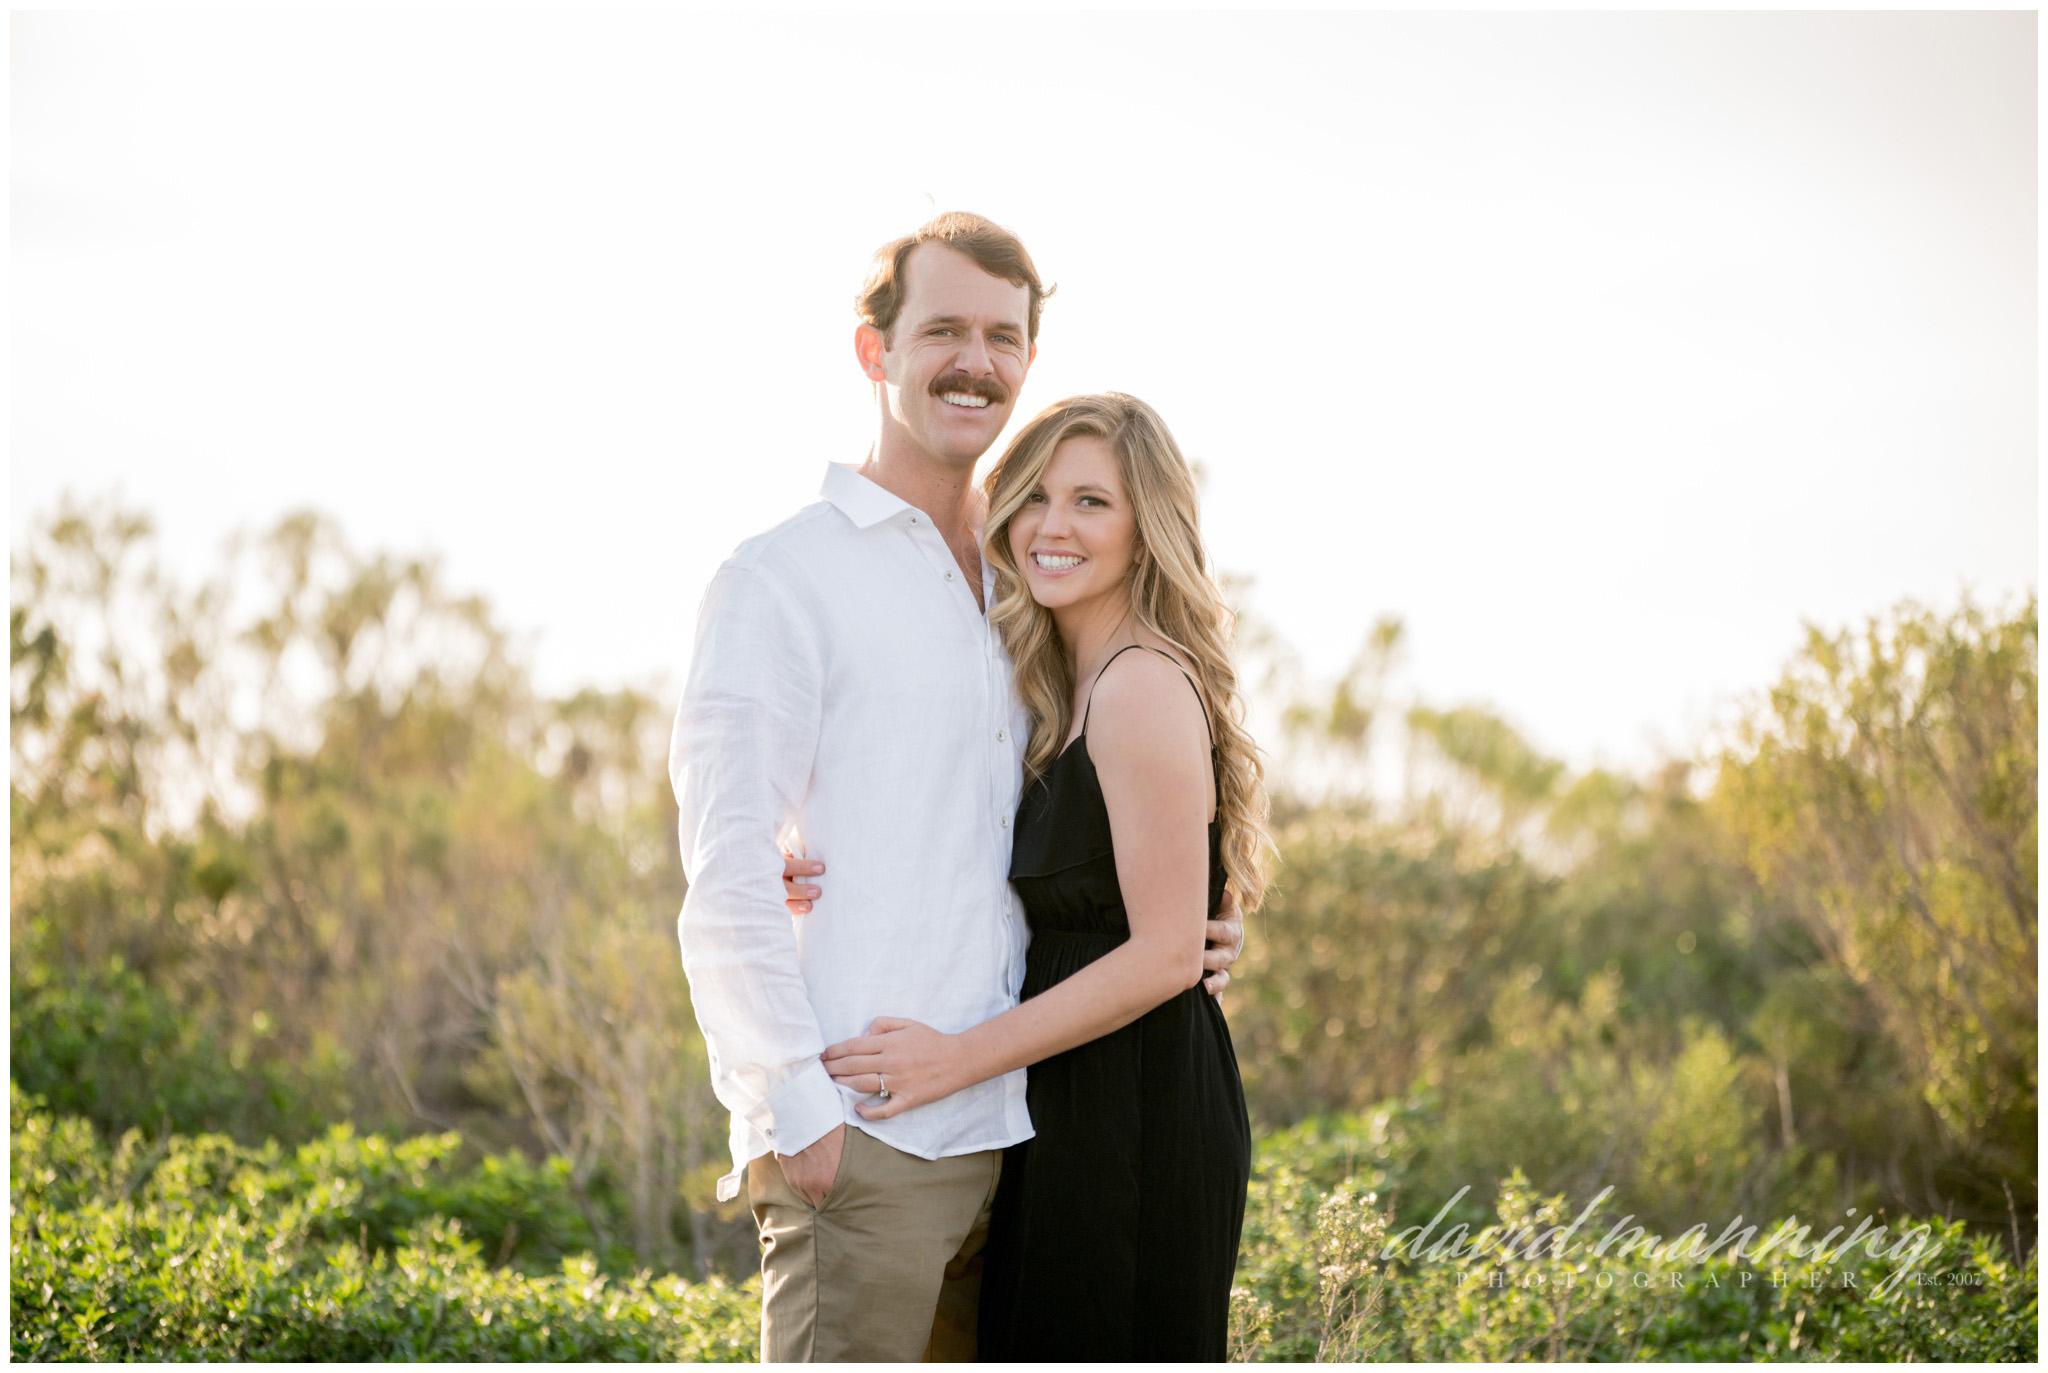 Alyssa-Taylor-Engagement-David-Manning-Photographer-0107.JPG